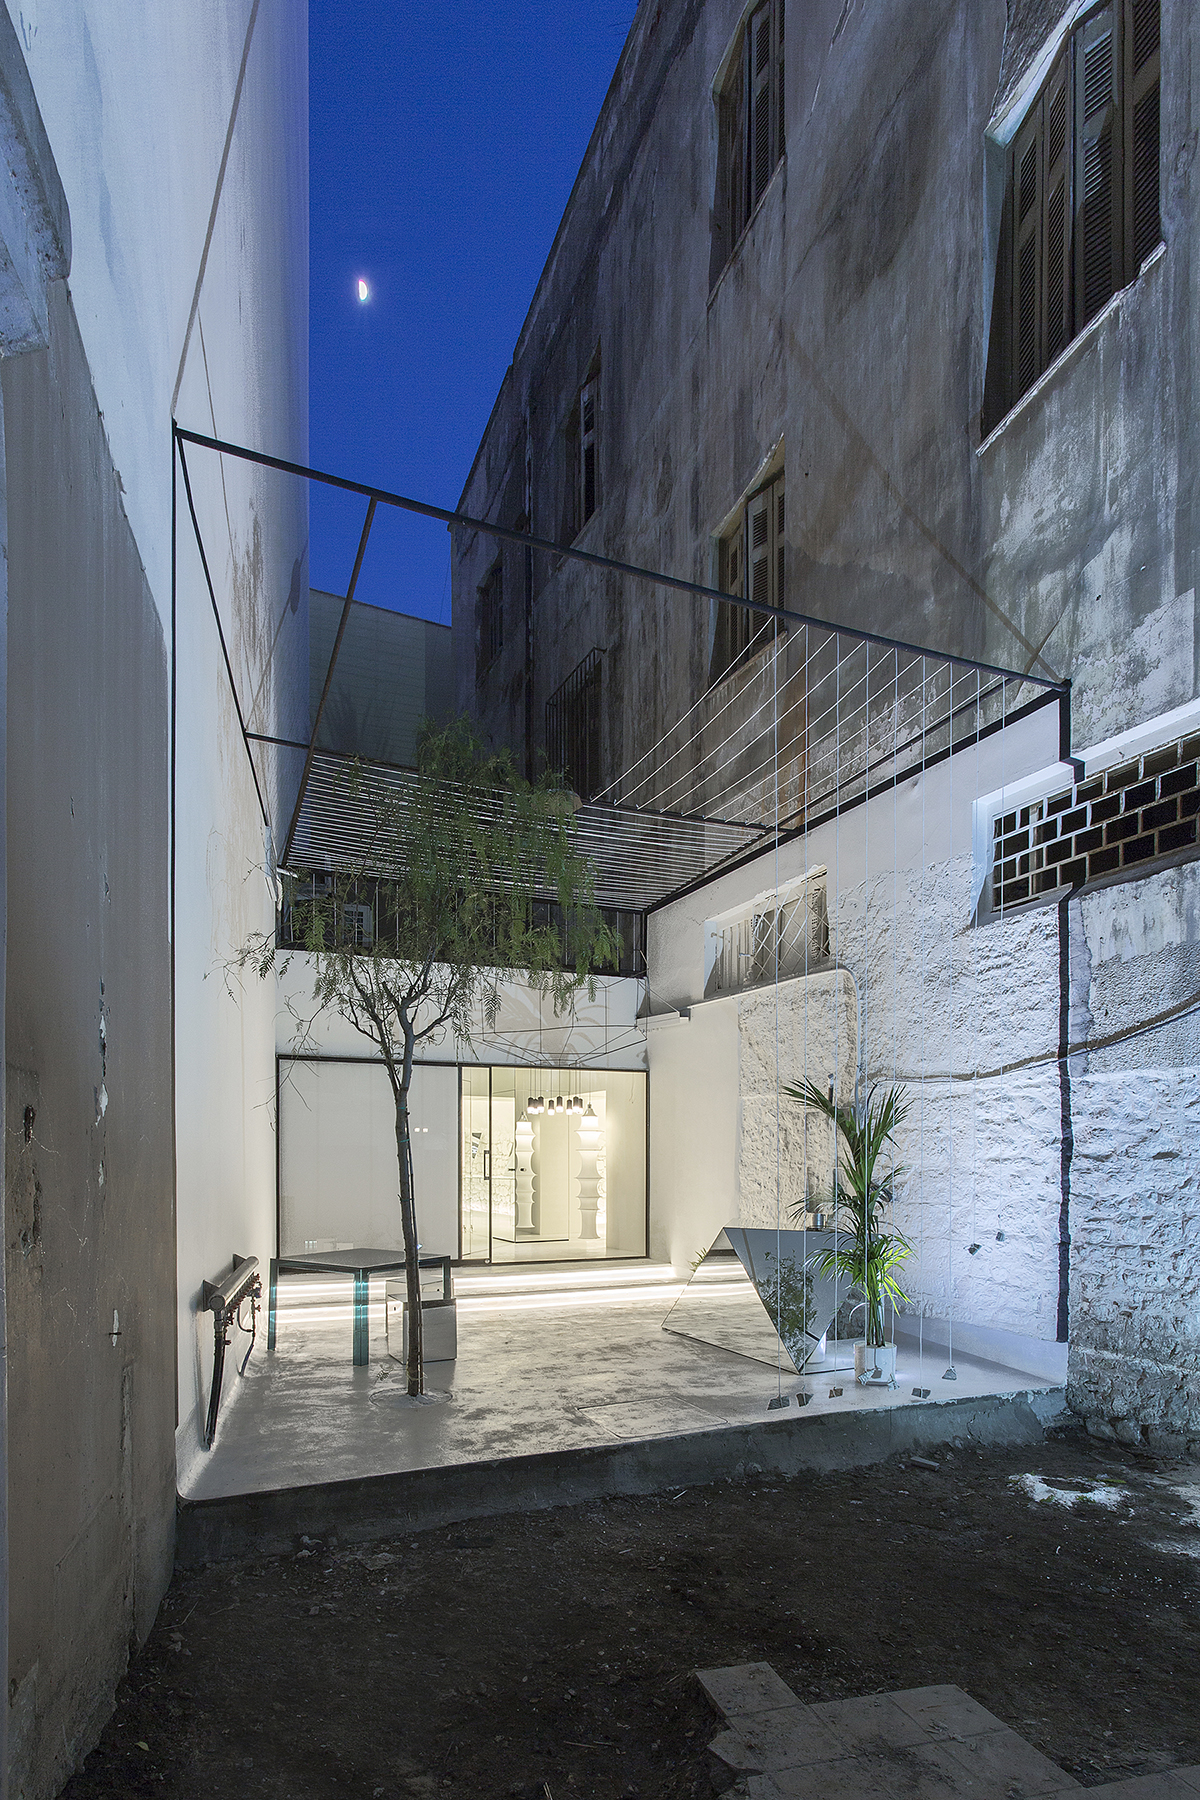 314 architecture studio pavlos chatziangelidis for Architecture studio